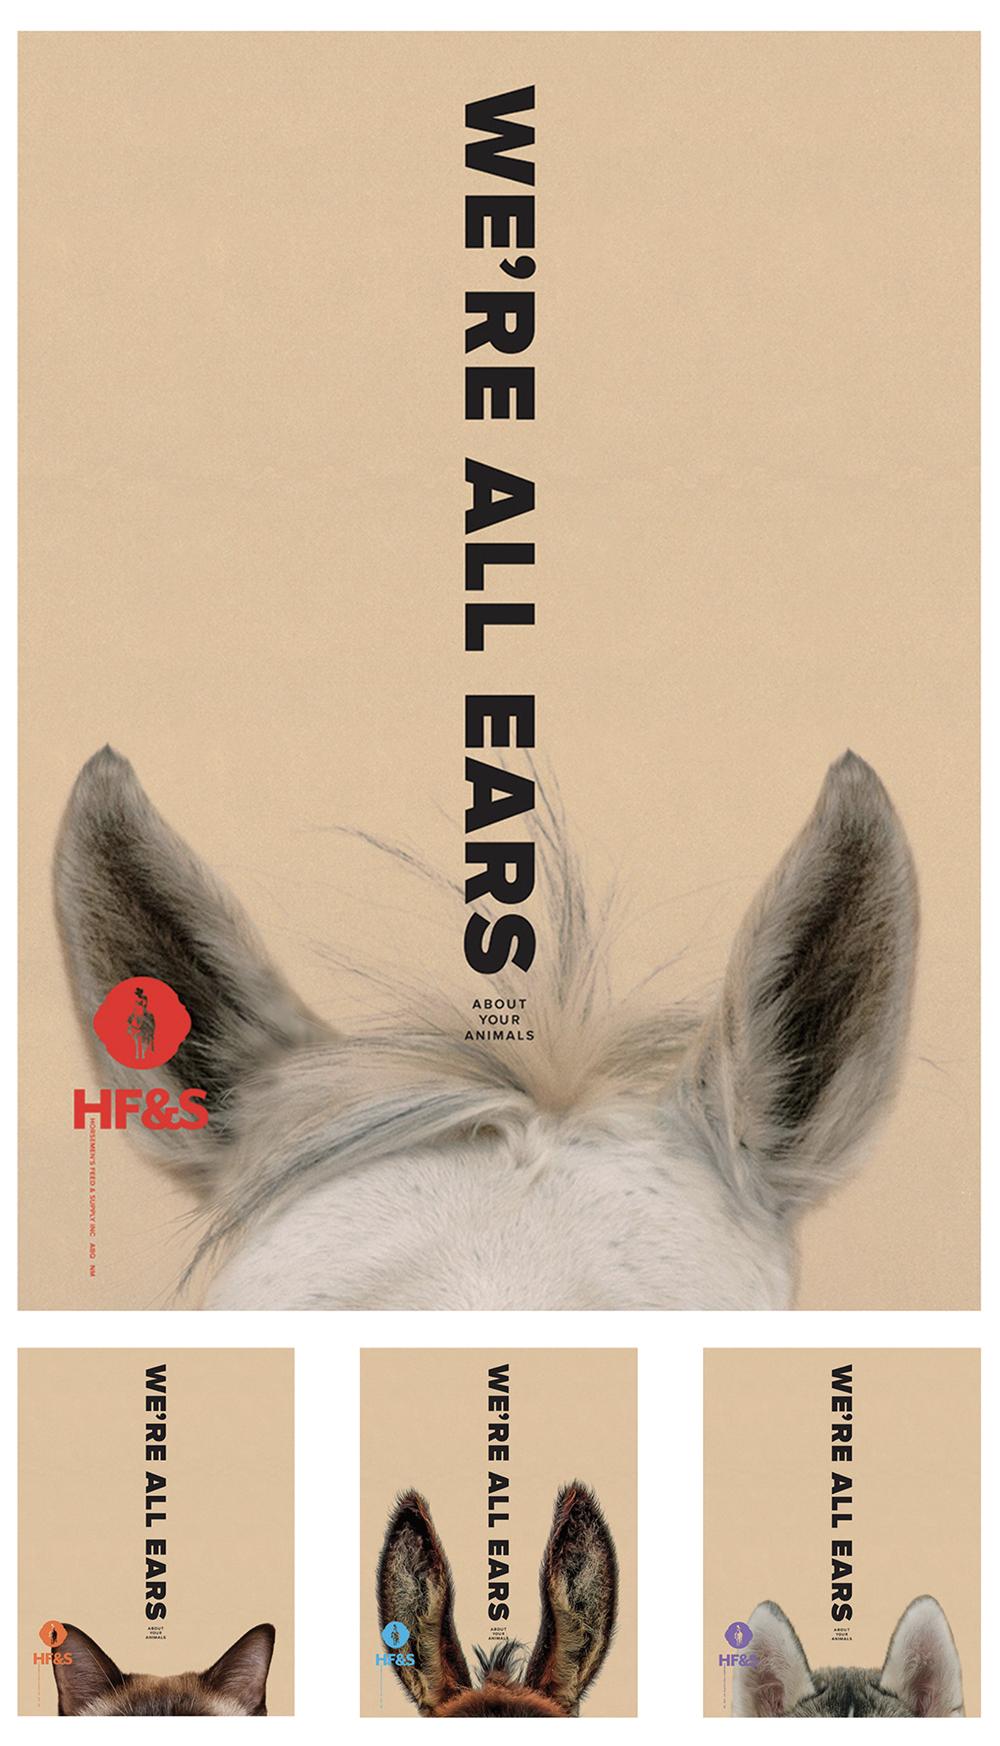 RK Venture_Horsemen's Feed.jpg